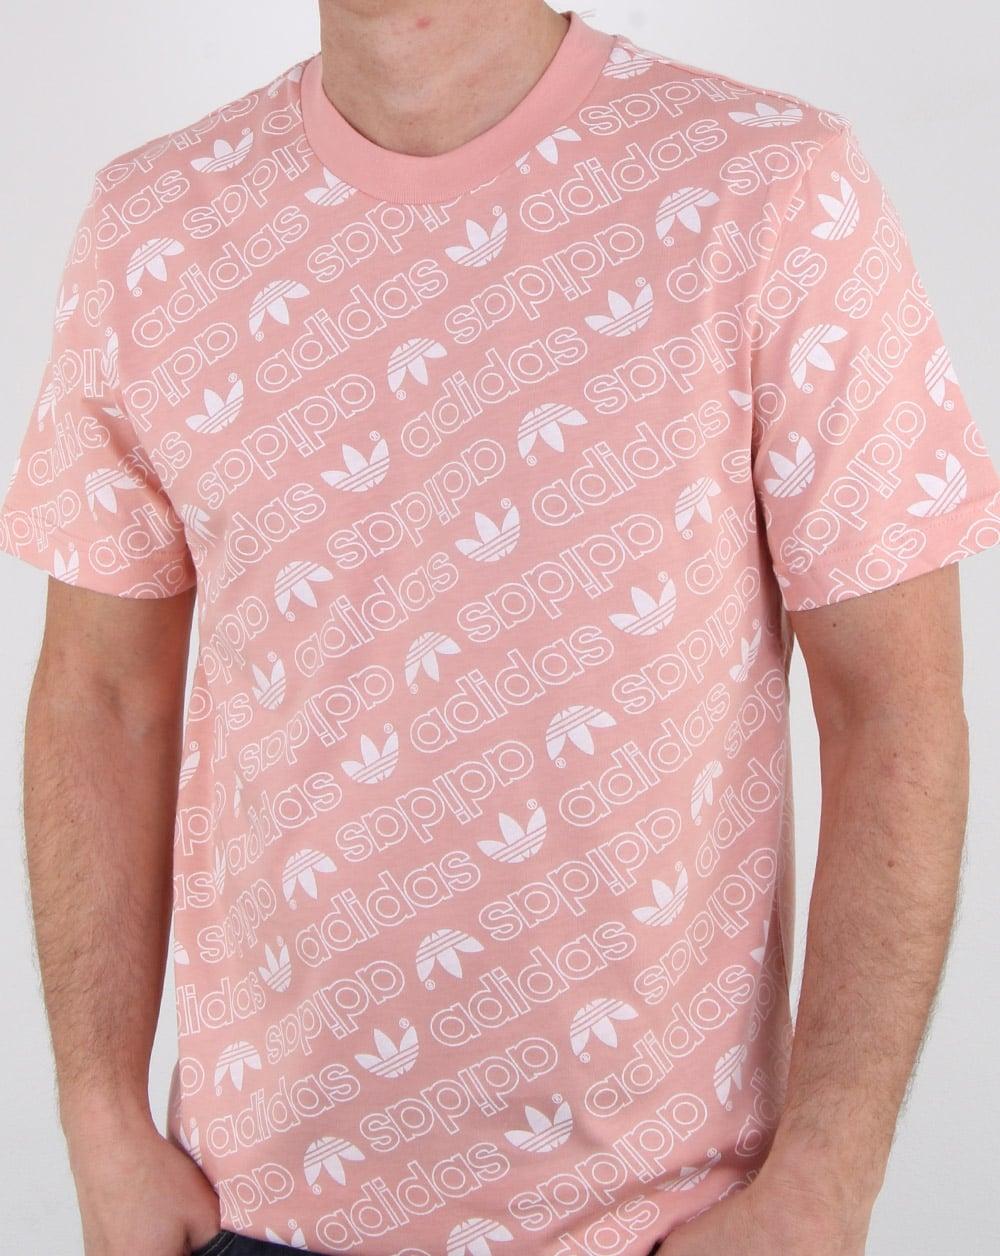 b94658fa5132 Adidas Originals Aop T Shirt Dust Pink, Mens, Tee, Cotton, Crew Neck